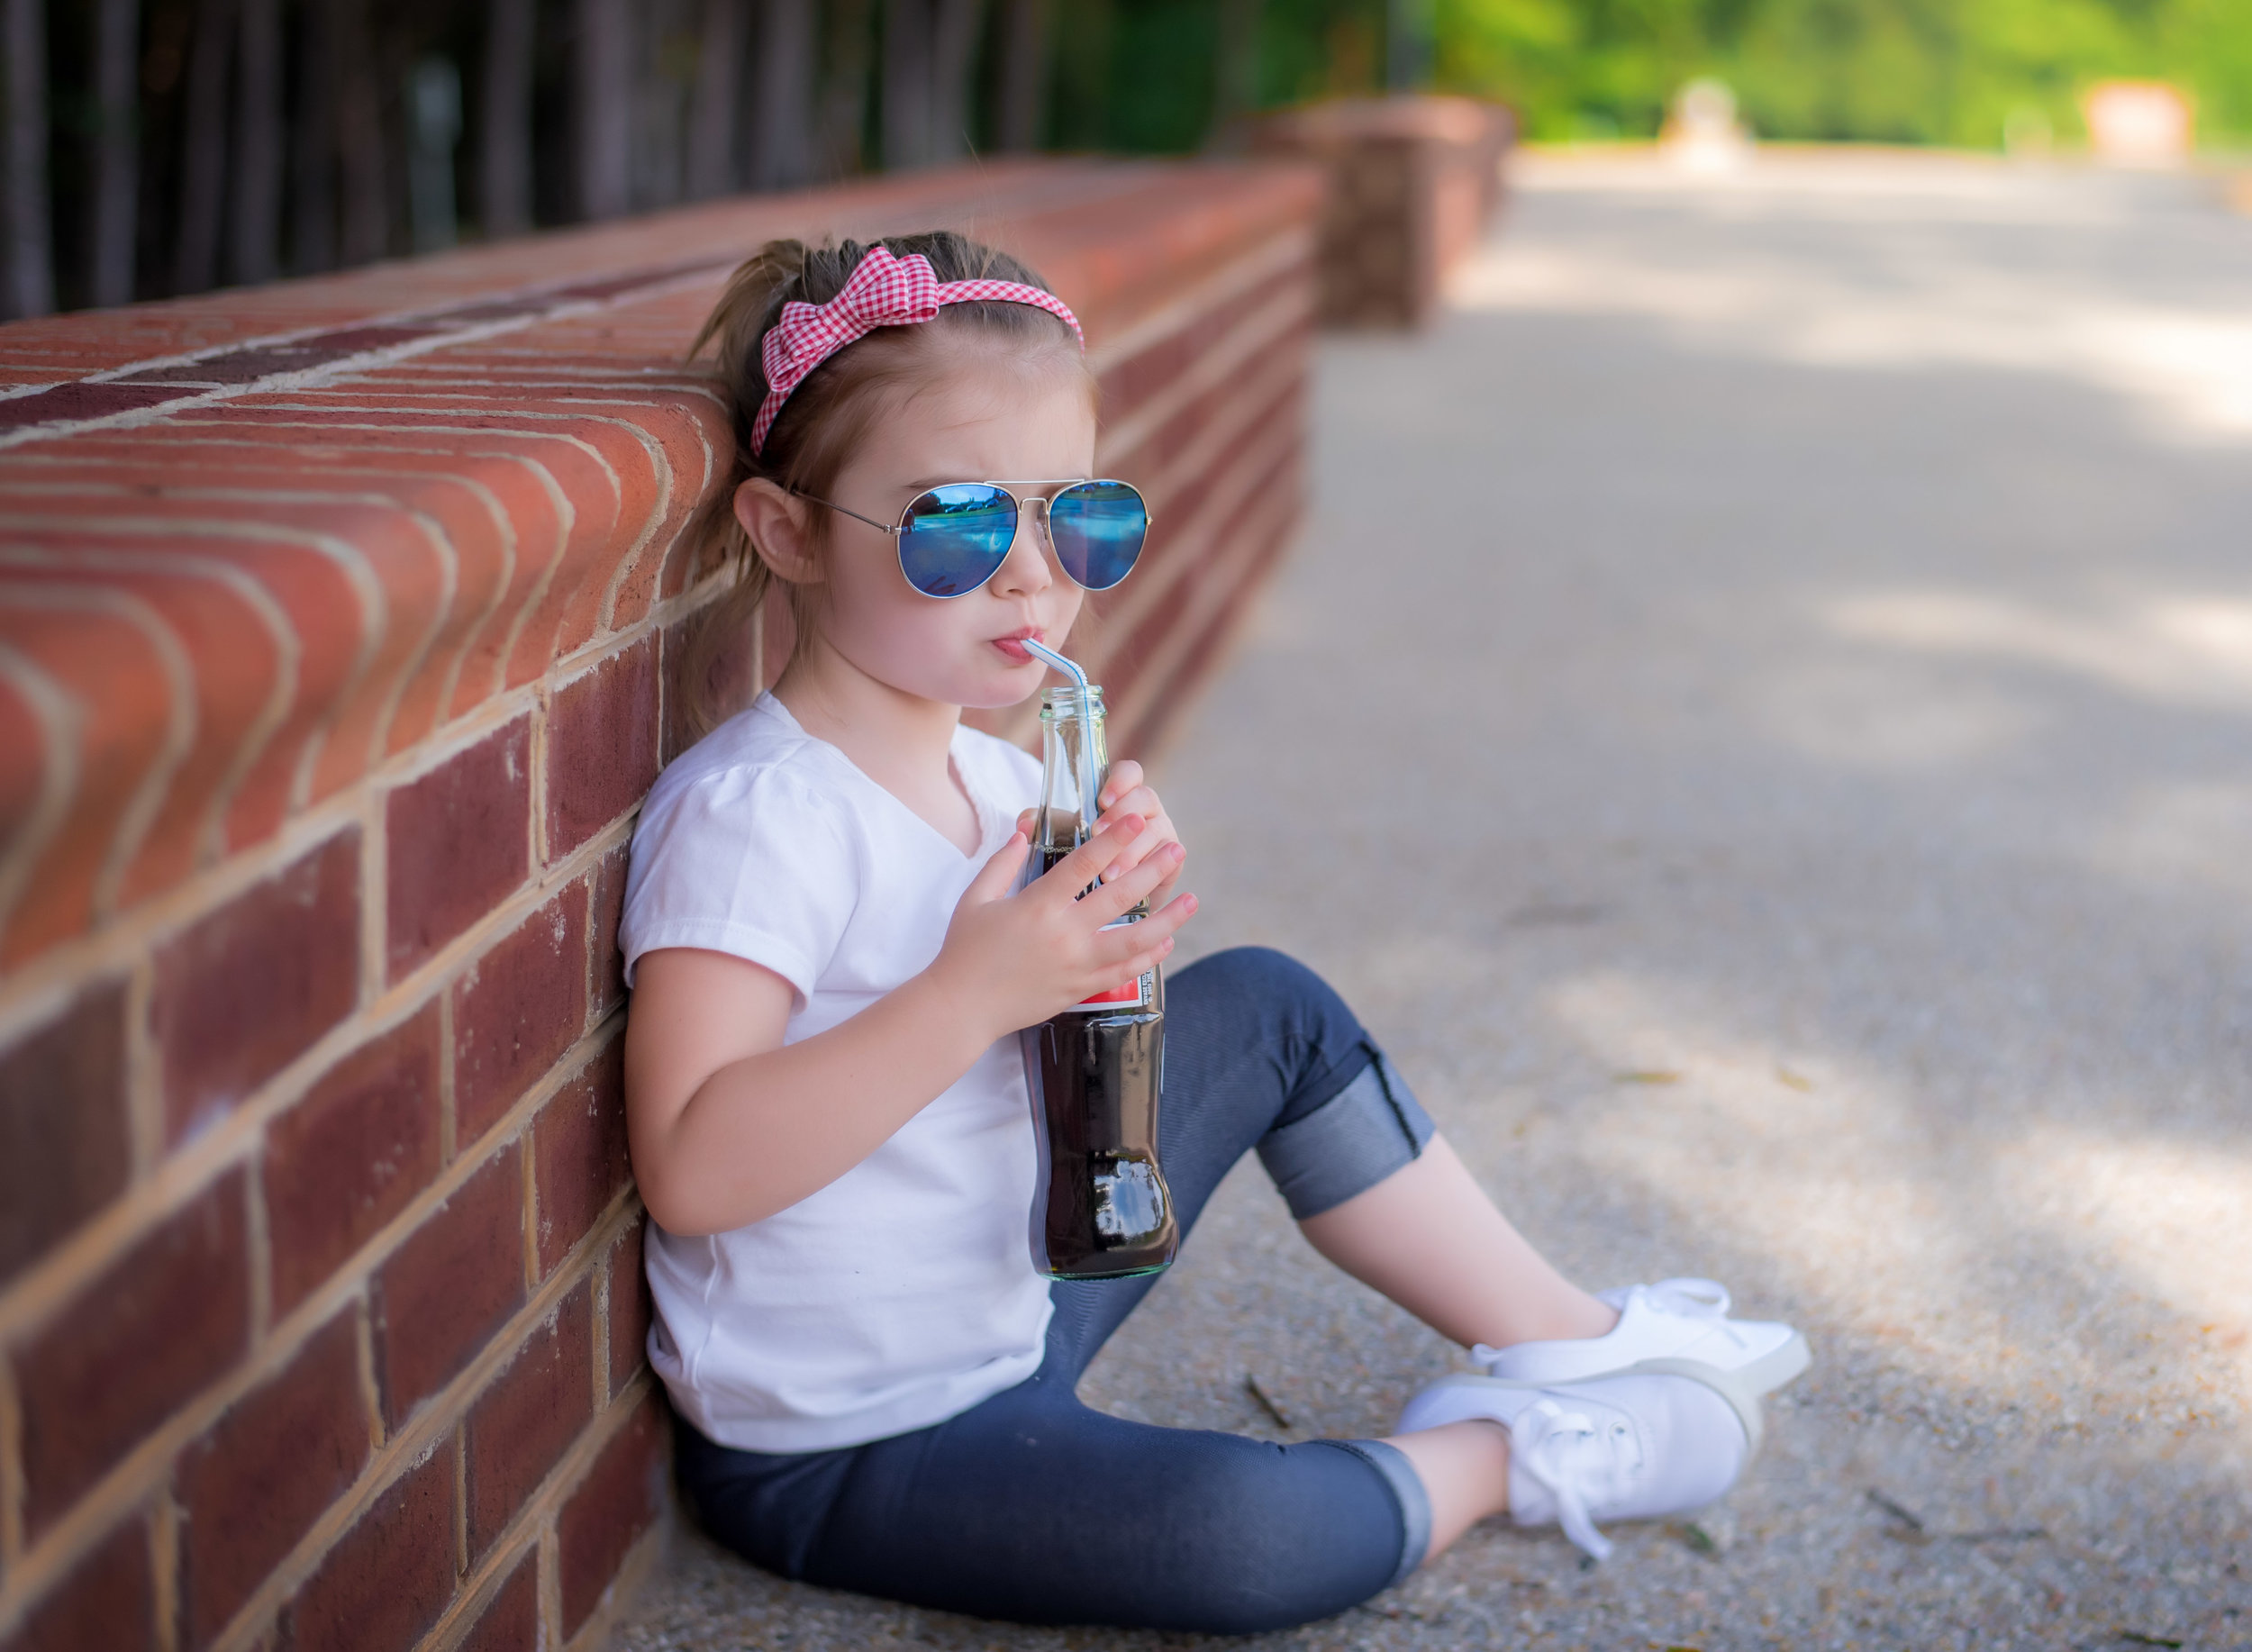 Vintage Theme Coca Cola 4th of July Portrait at crump park in henrico virginia